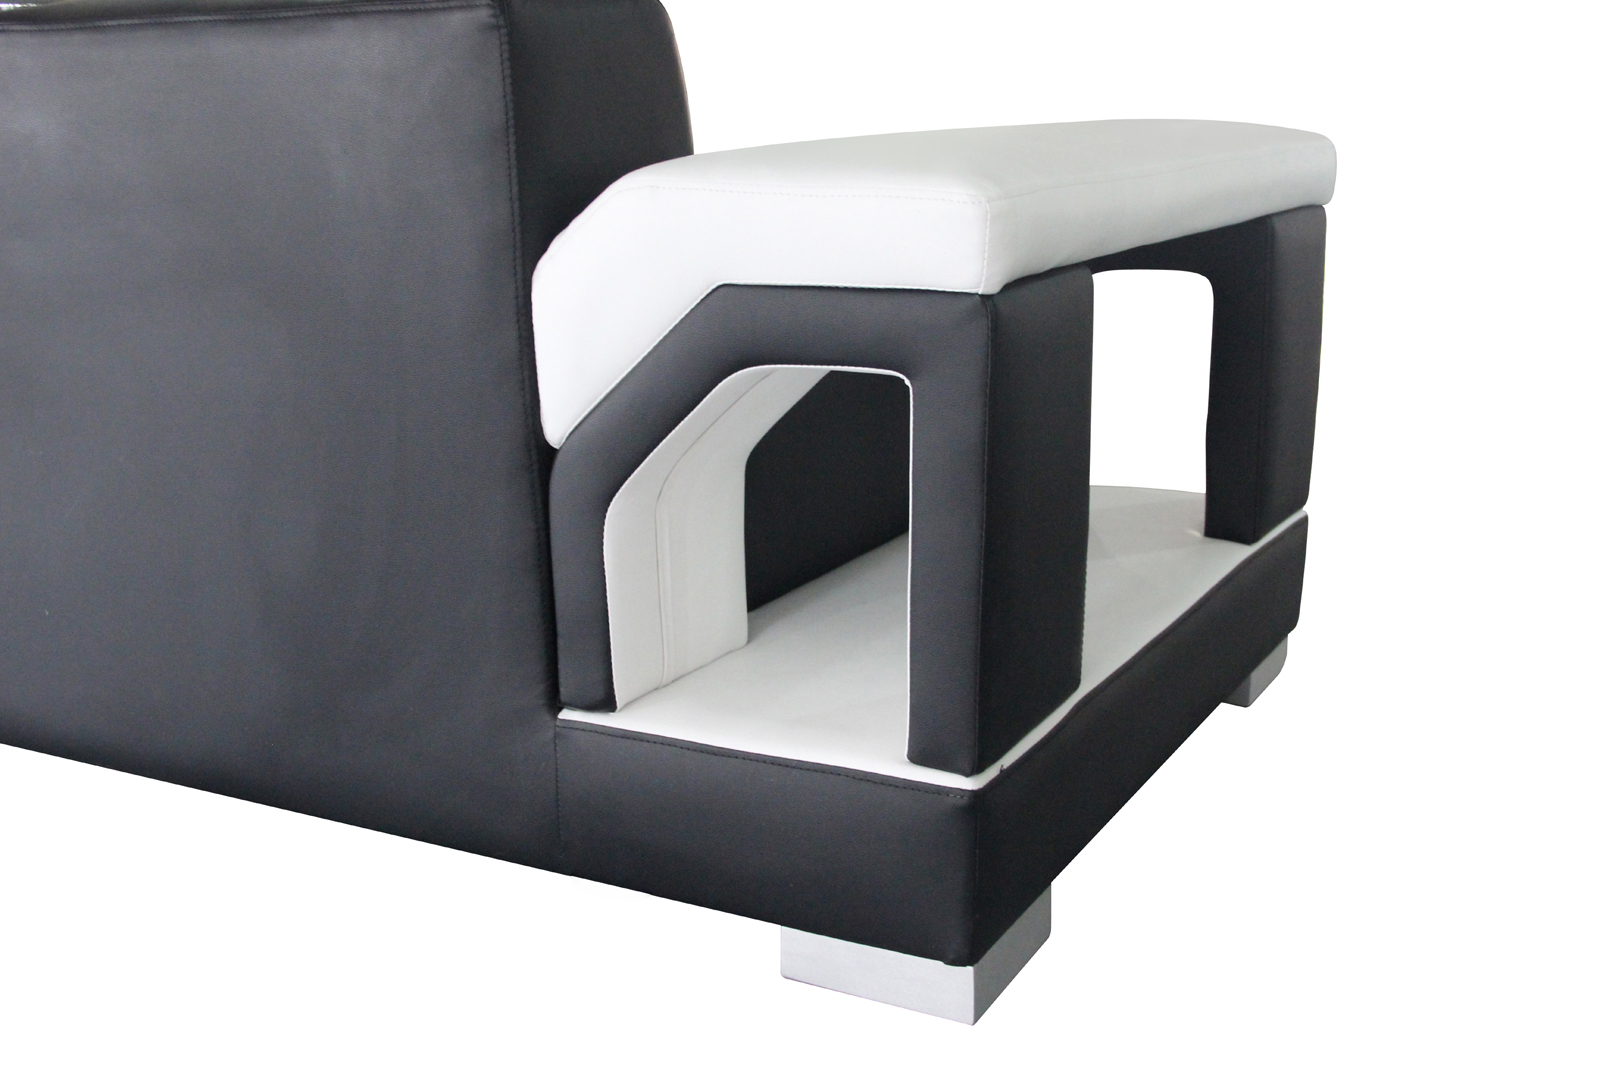 sam sofa schwarz wei wohnlandschaft zippora 166 x 390. Black Bedroom Furniture Sets. Home Design Ideas